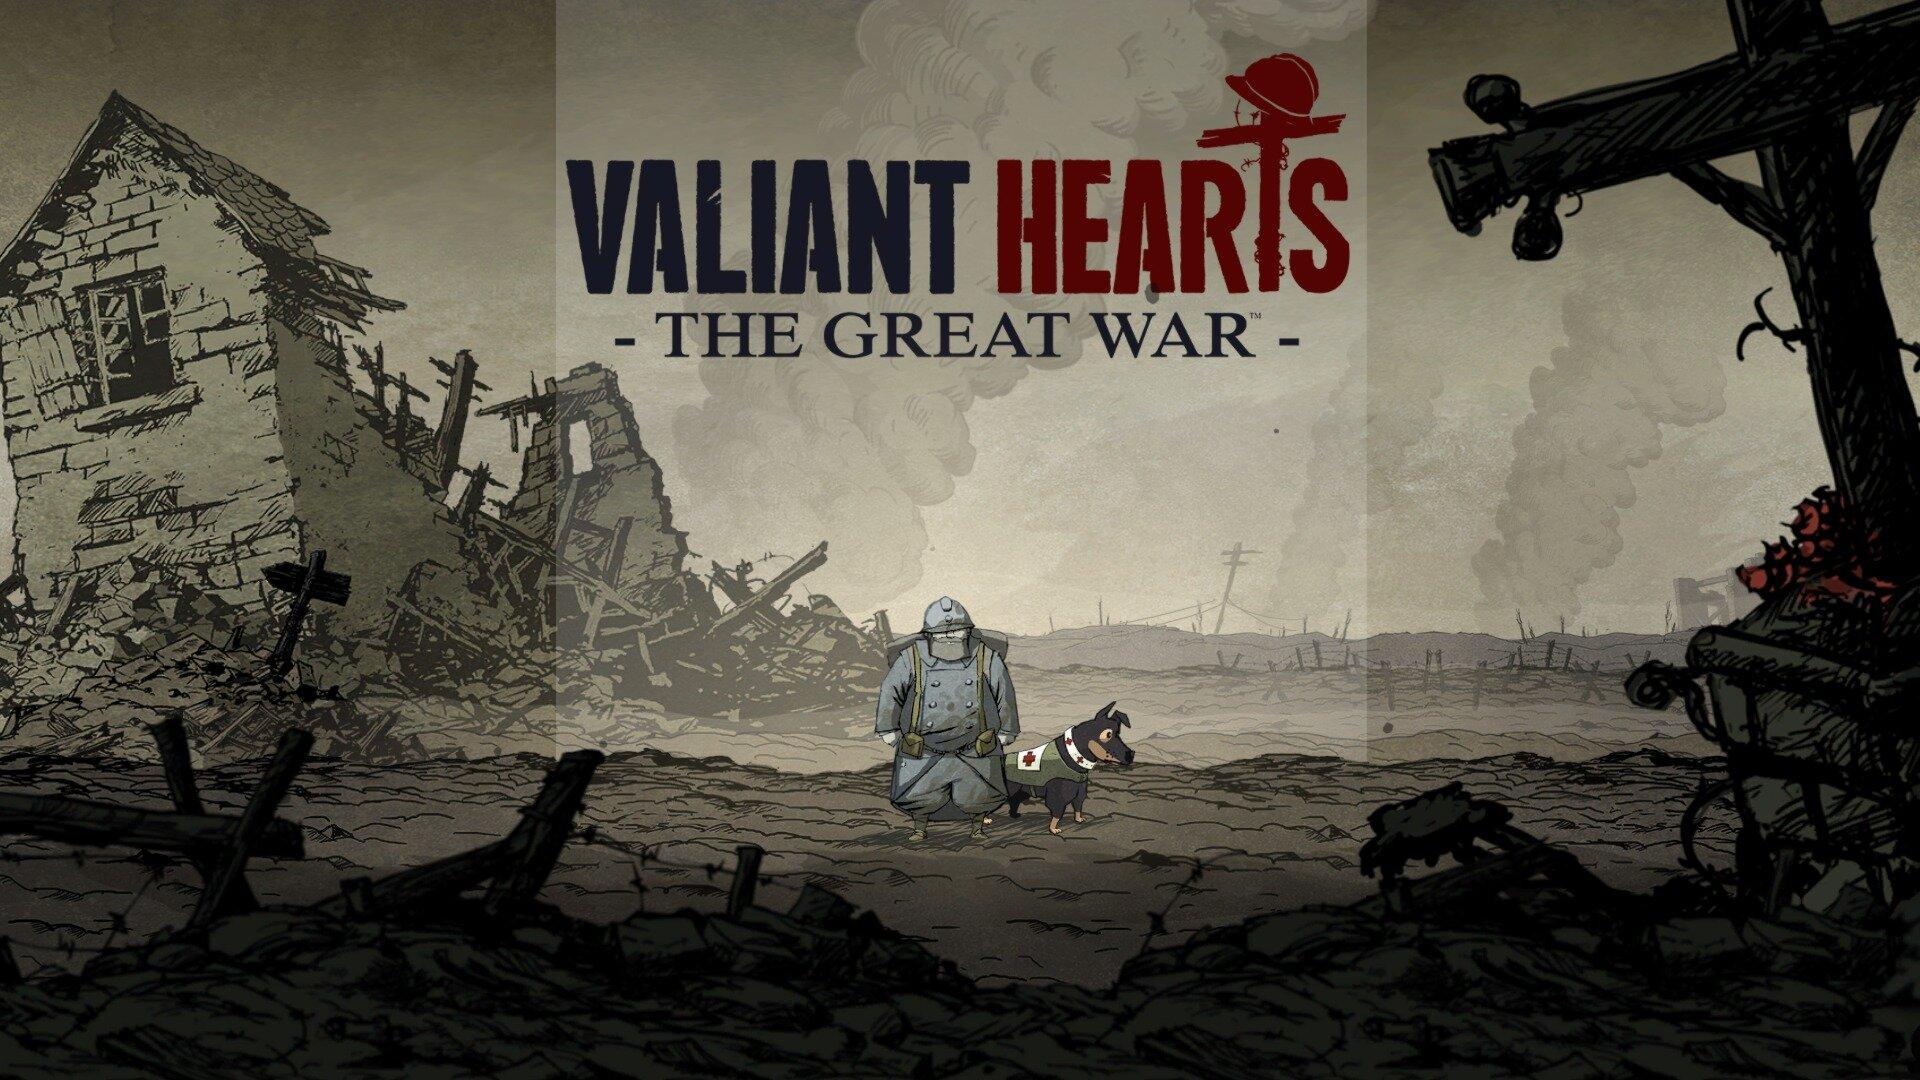 Valiant Hearts The Great War